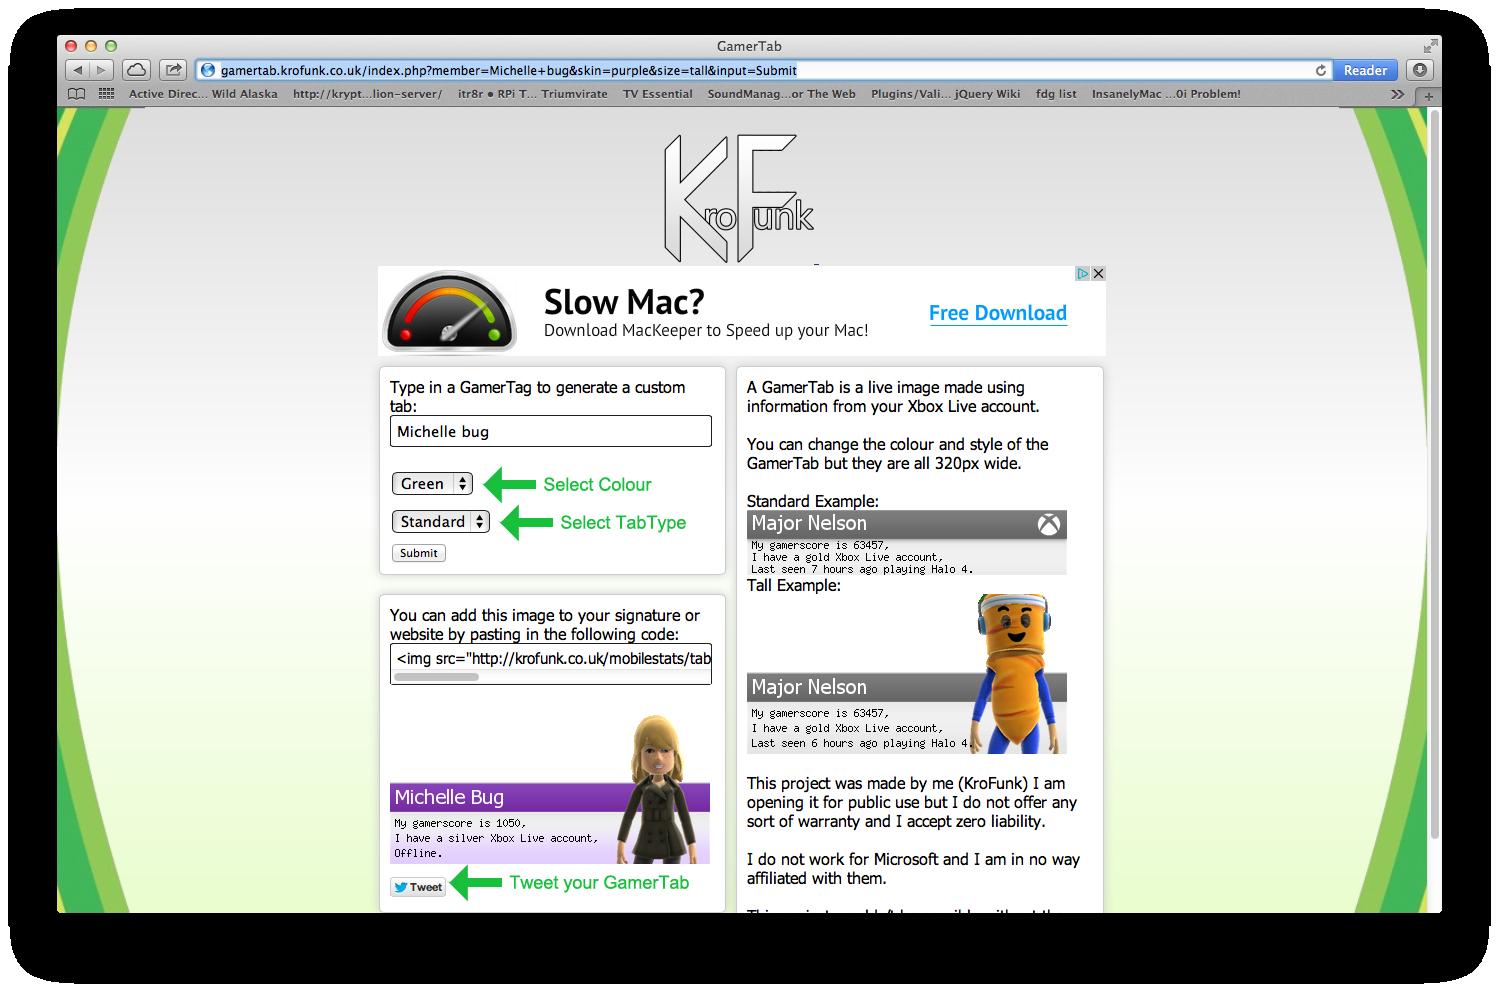 Robin's Blog: GamerTag Mobile WebApp lookup and GamerTab!